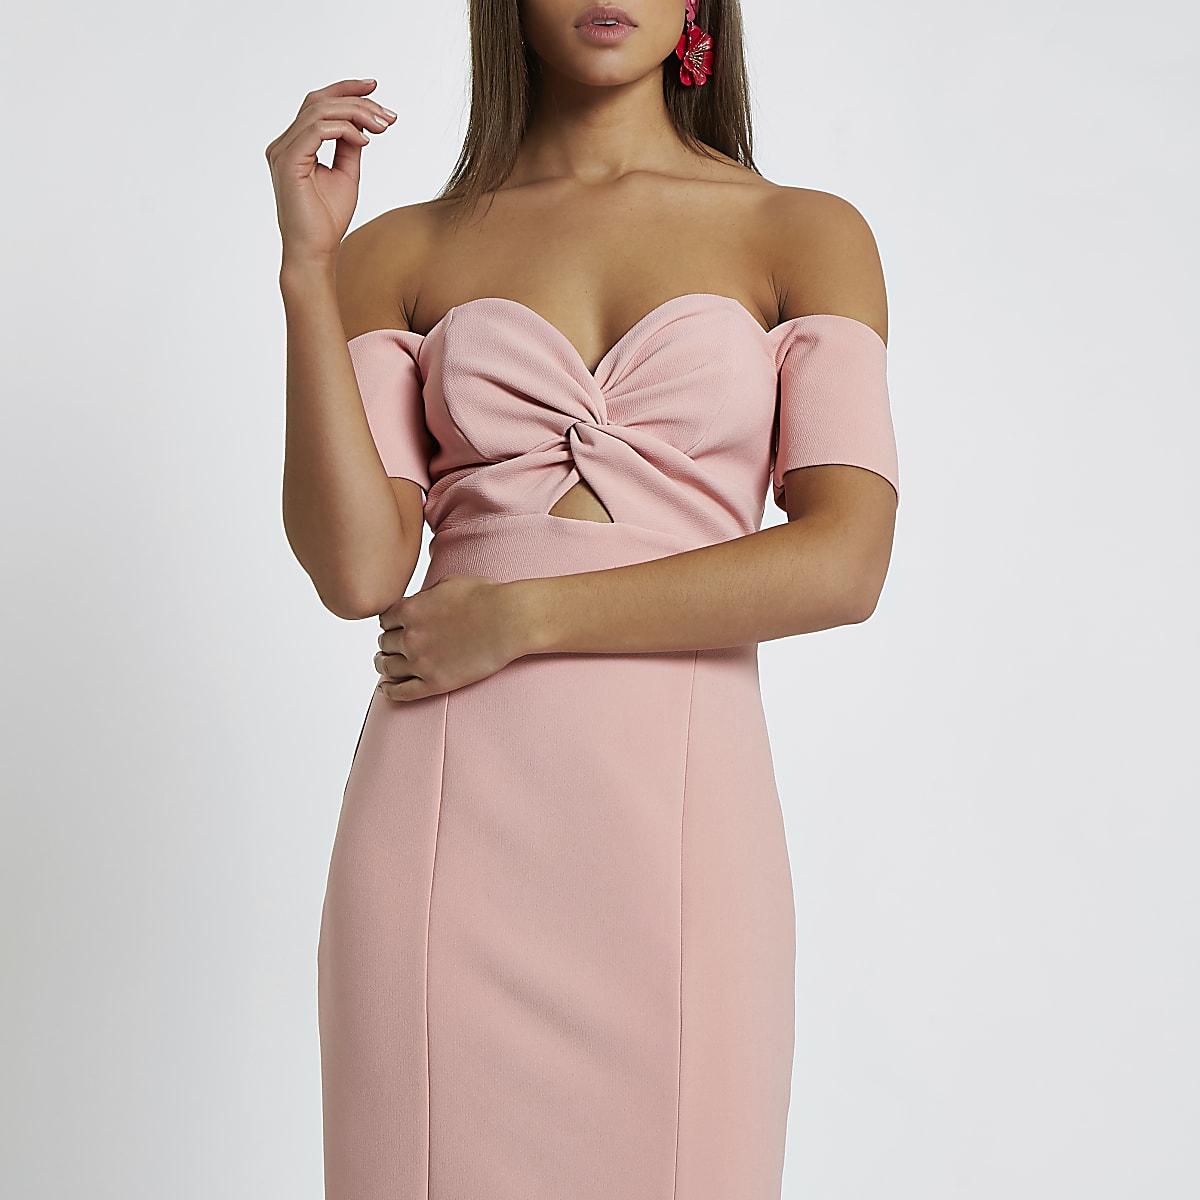 378ae8a8d0b188 Roze maxi-jurk in bardotstijl met strik voor - Maxi-jurken - Jurken ...